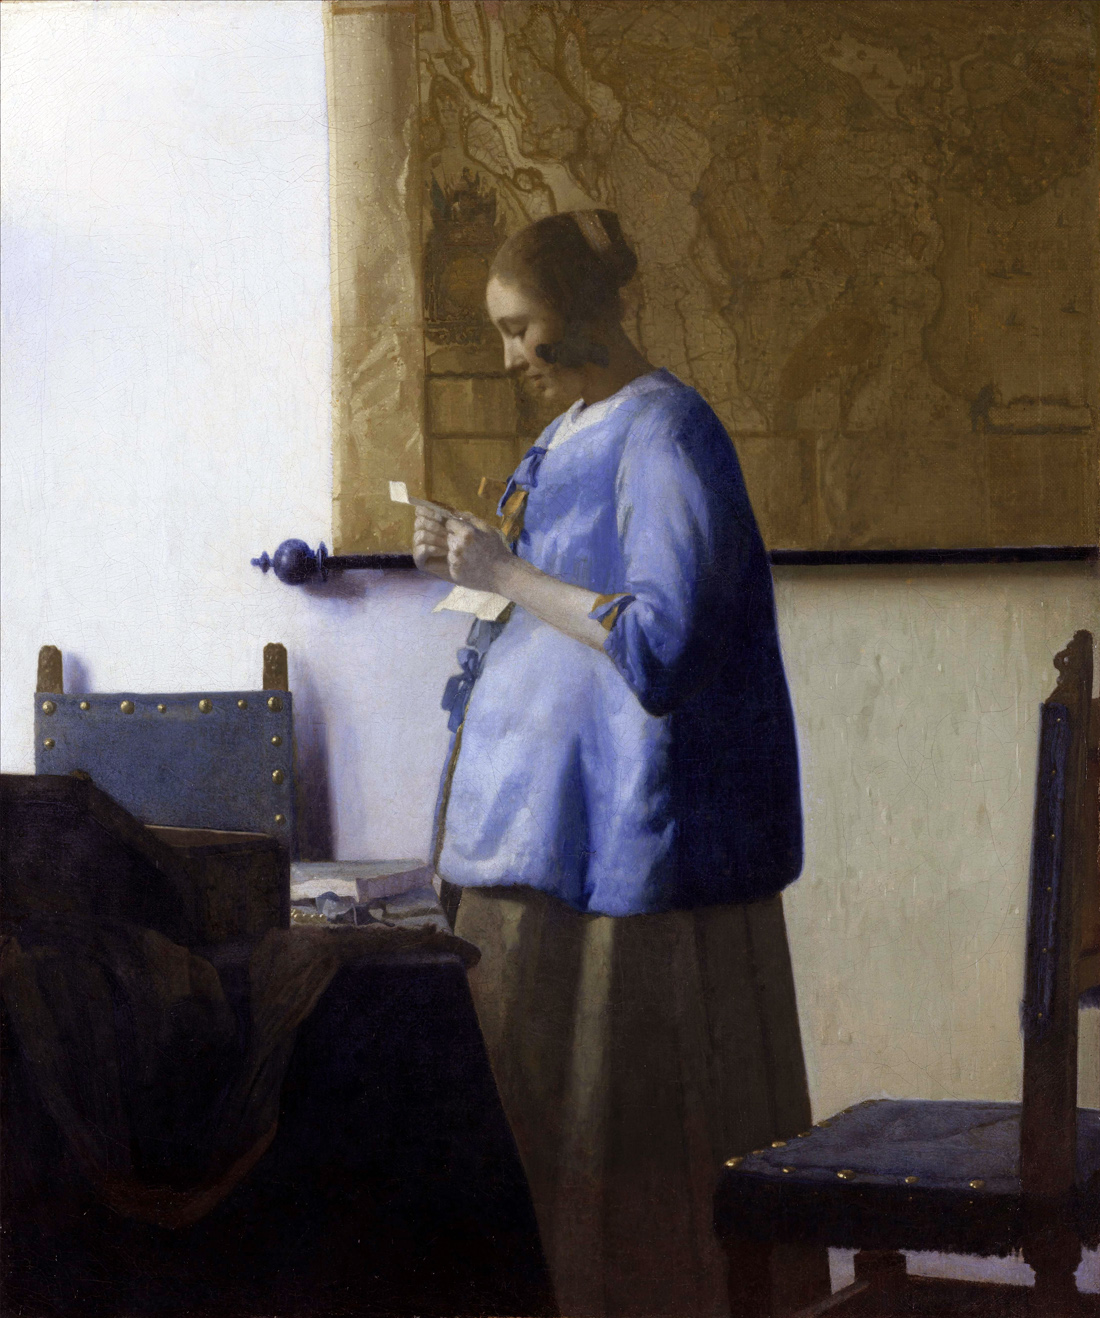 Woman in Blue Reading a Letter, by Jan Vermeer, c. 1662–1665. Rijksmuseum, Amsterdam, Netherlands.